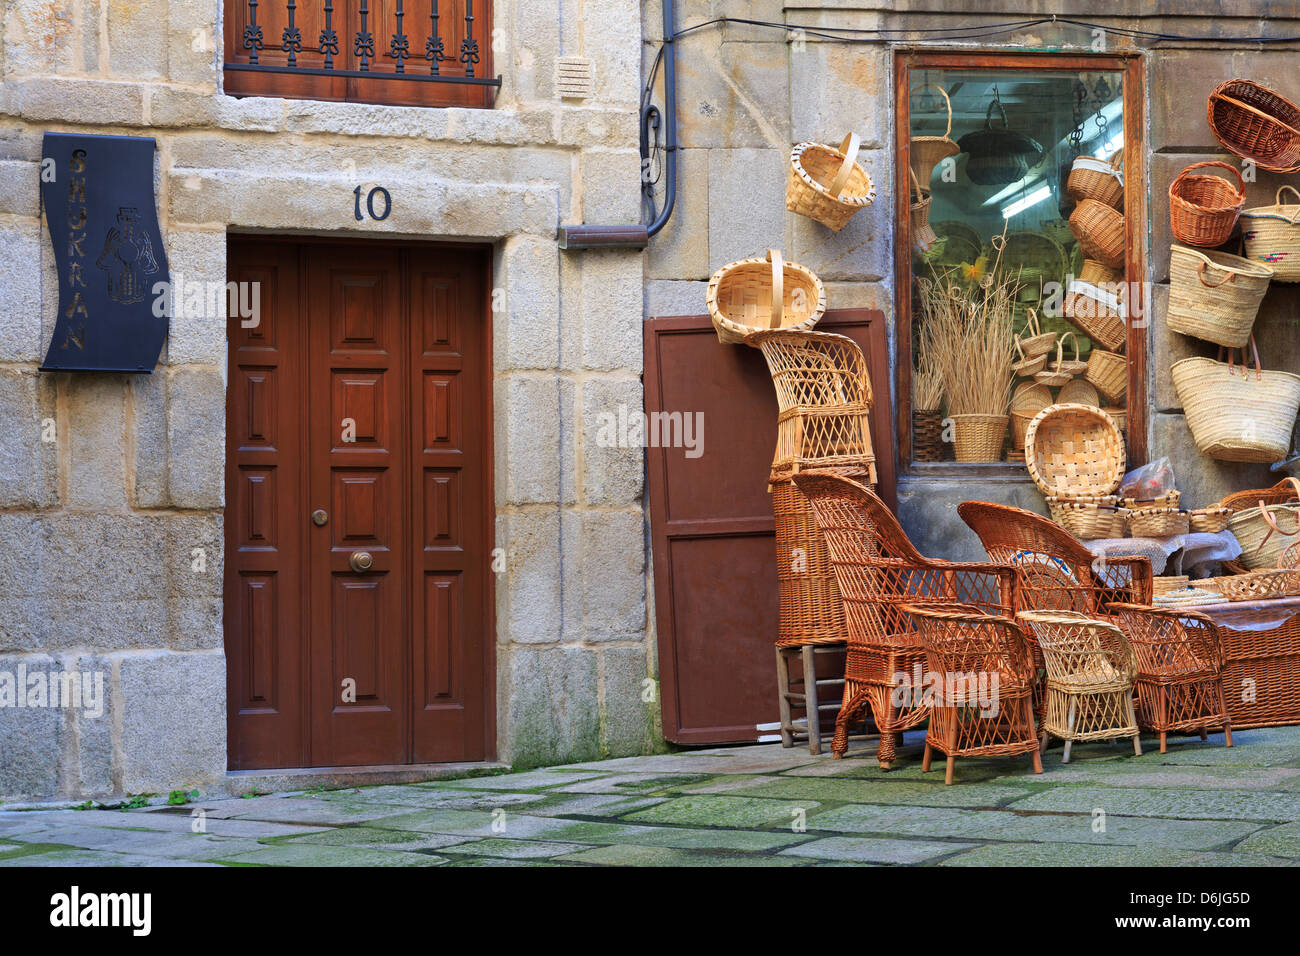 Baskets for sale in the Historic Centre, Vigo, Galicia, Spain, Europe - Stock Image